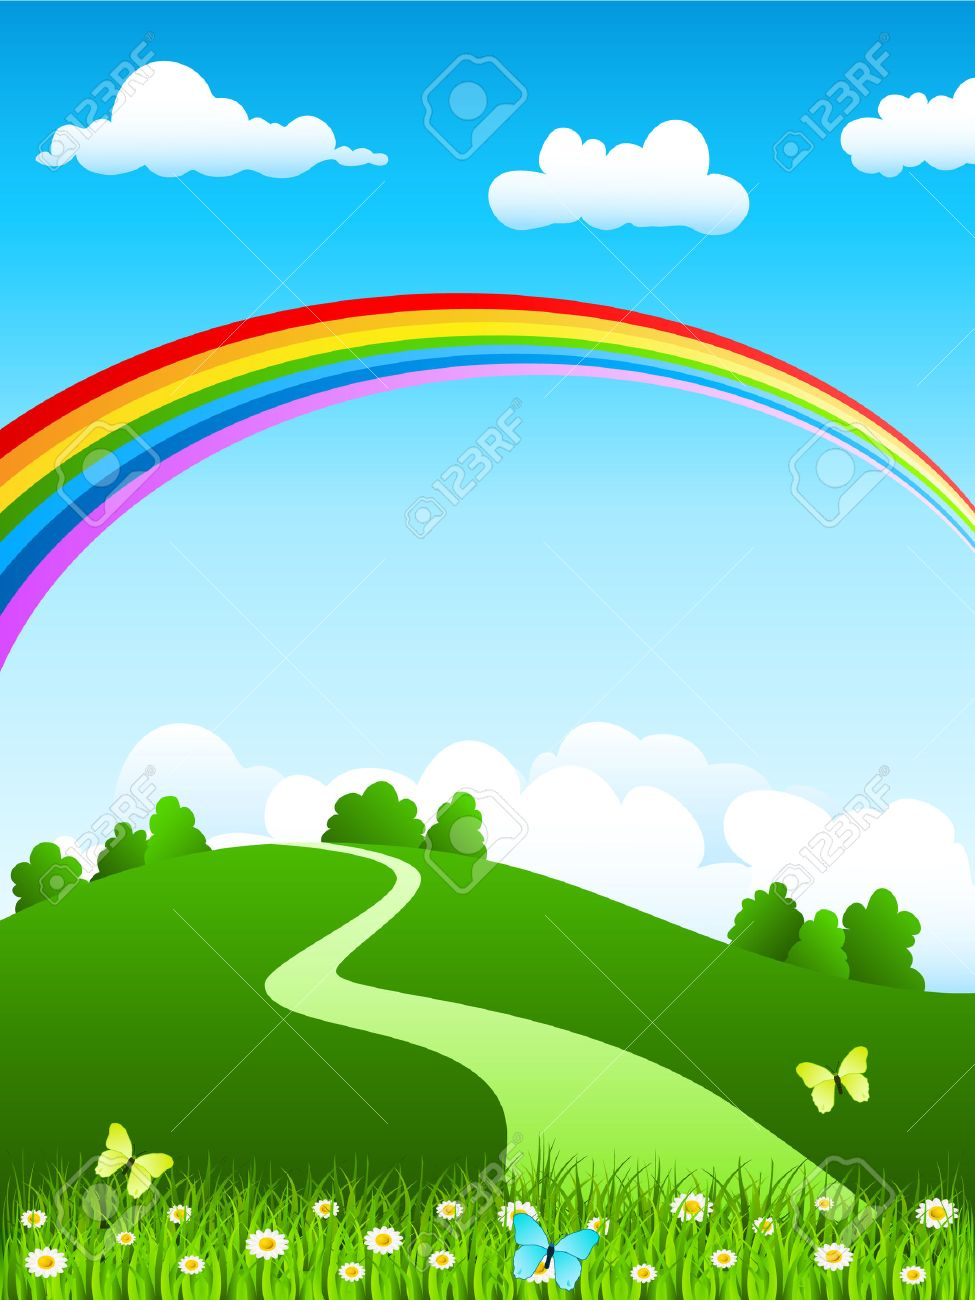 Beautiful garden cartoon - Garden Cartoon Nature Landscape With Rainbow